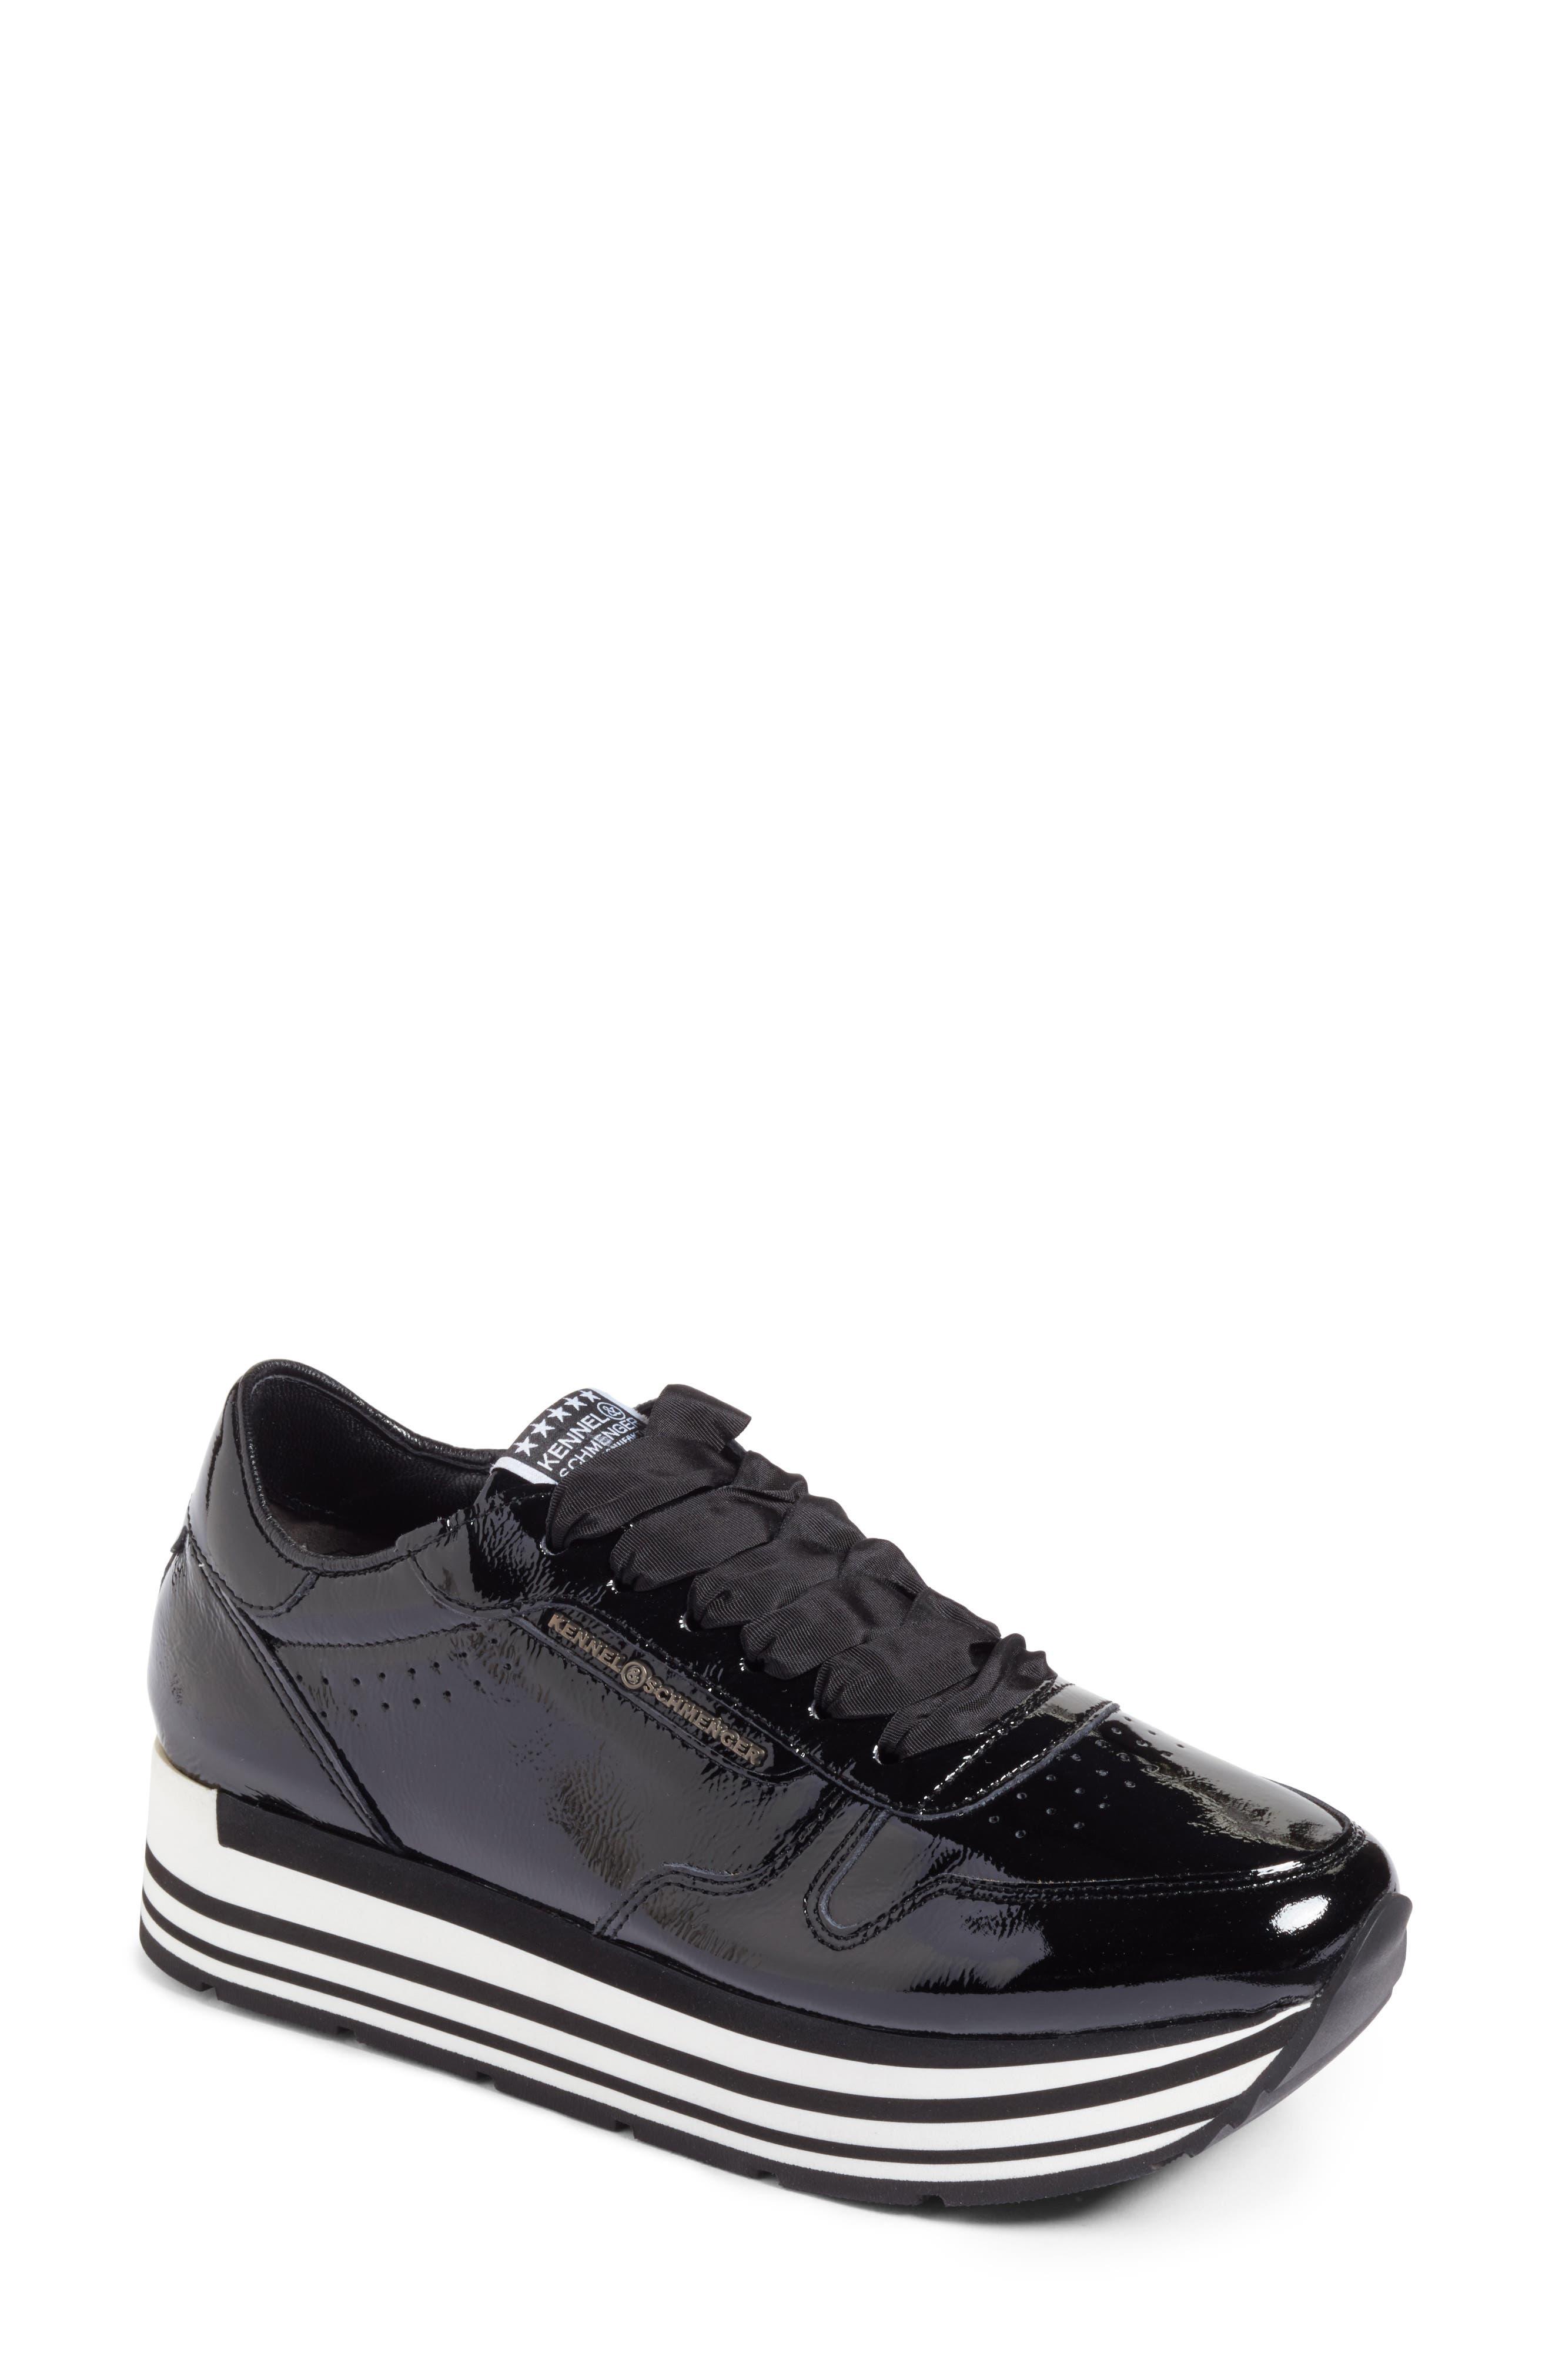 Kennel & Schmenger Nova Patent Leather Sneaker,                             Main thumbnail 1, color,                             Black